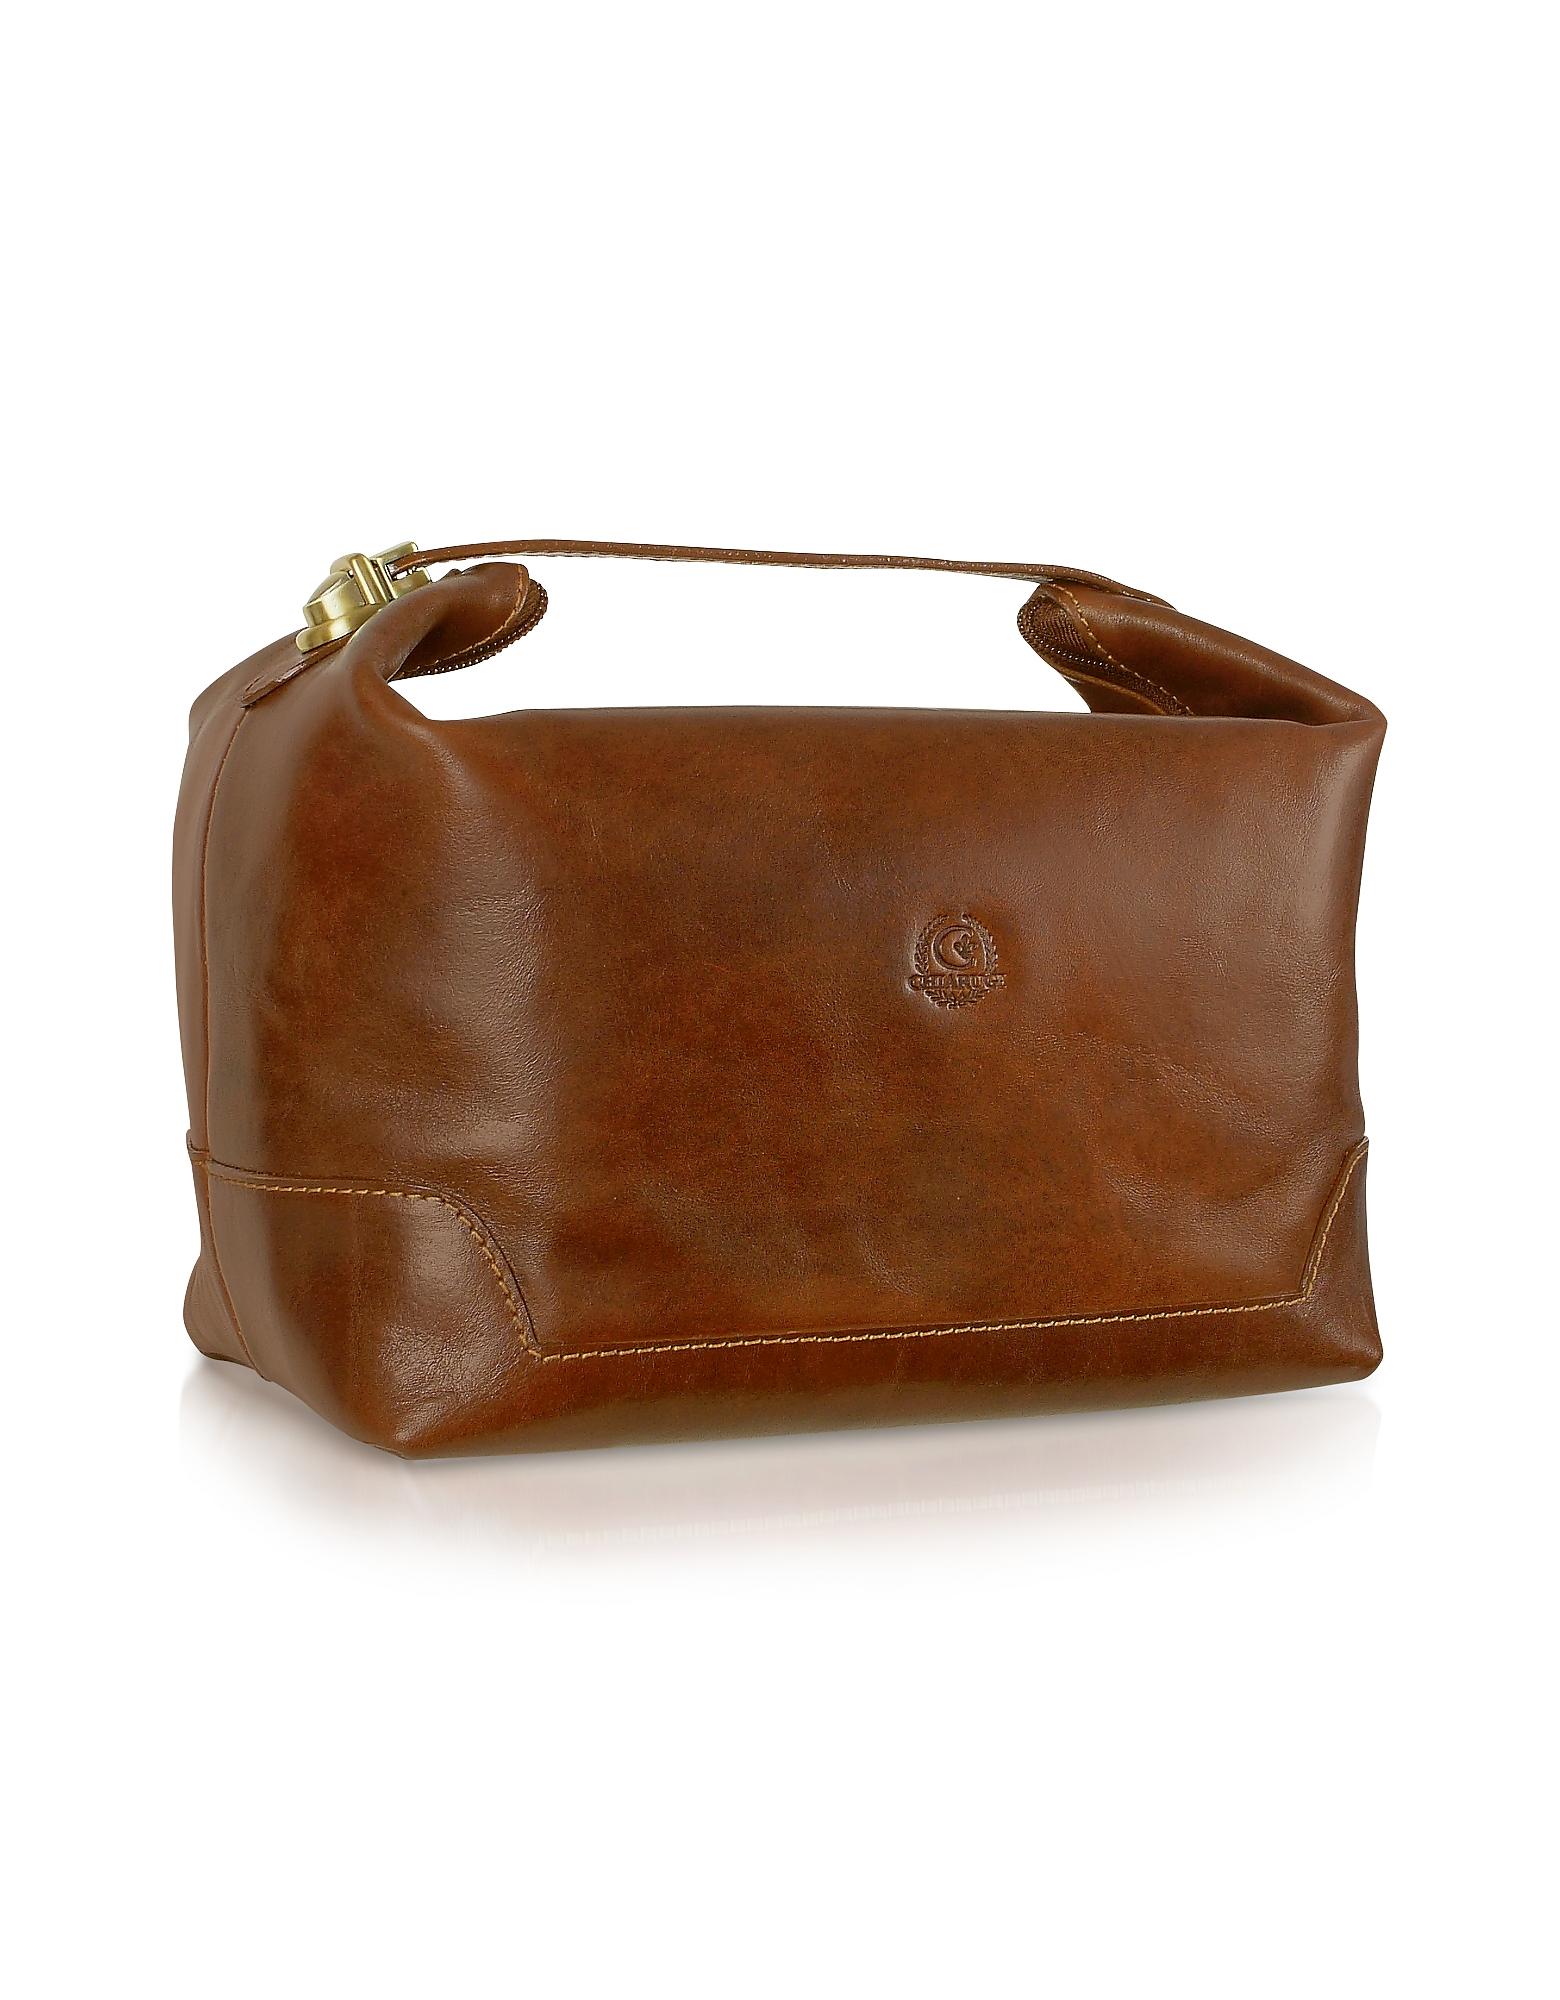 Handmade Brown Genuine Italian Leather Toiletry Travel Case